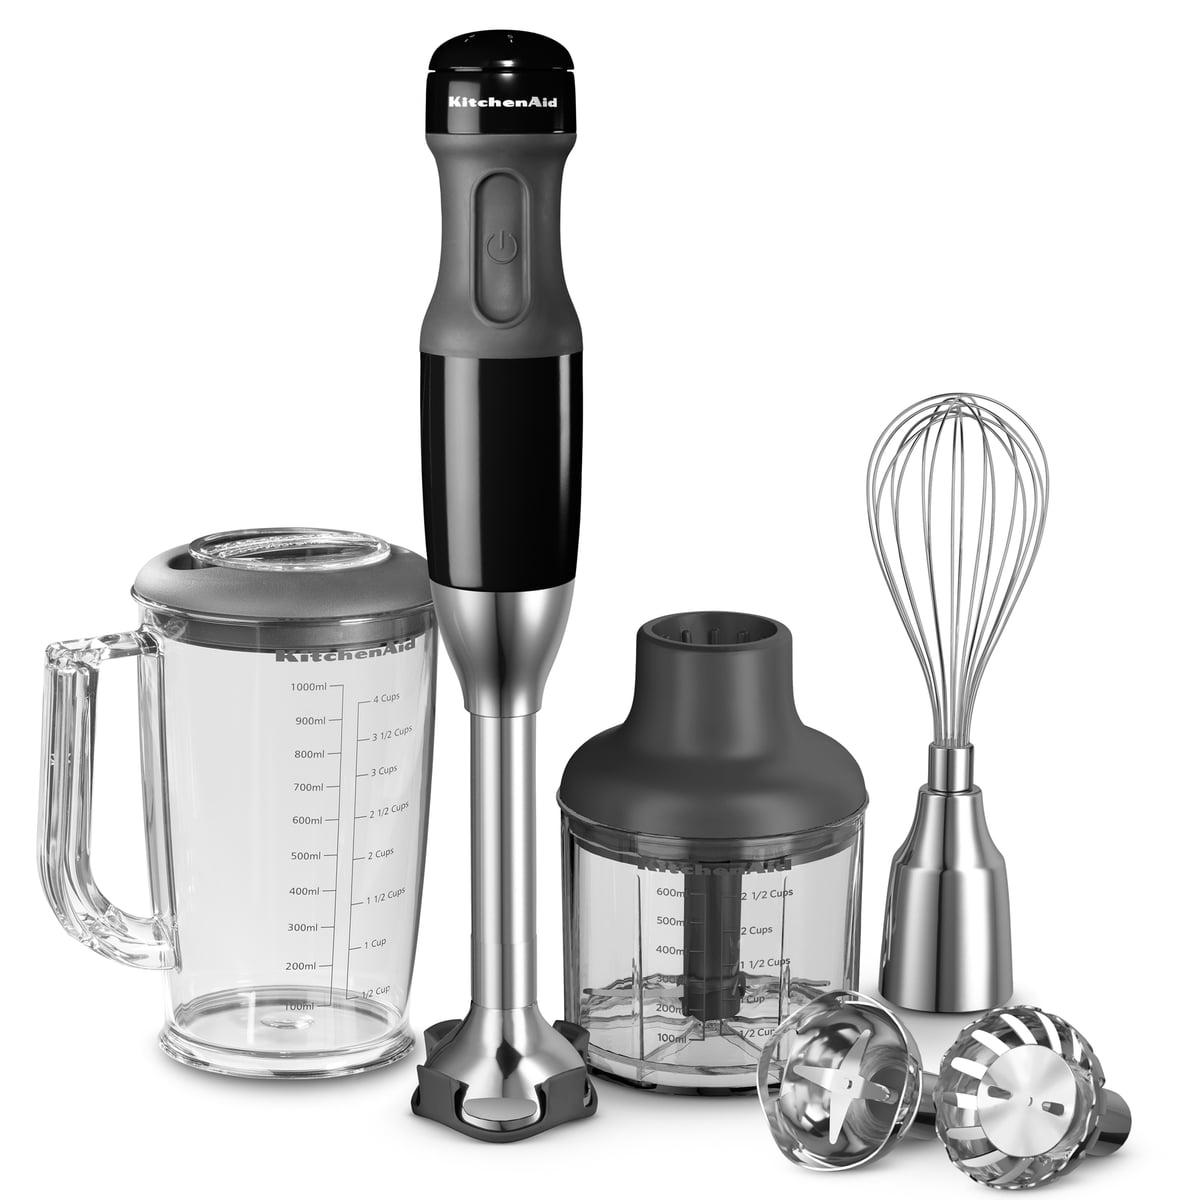 kitchenaid hand mixer 5 speed. kitchenaid - hand blender with 5 speed levels, onyx black kitchenaid mixer